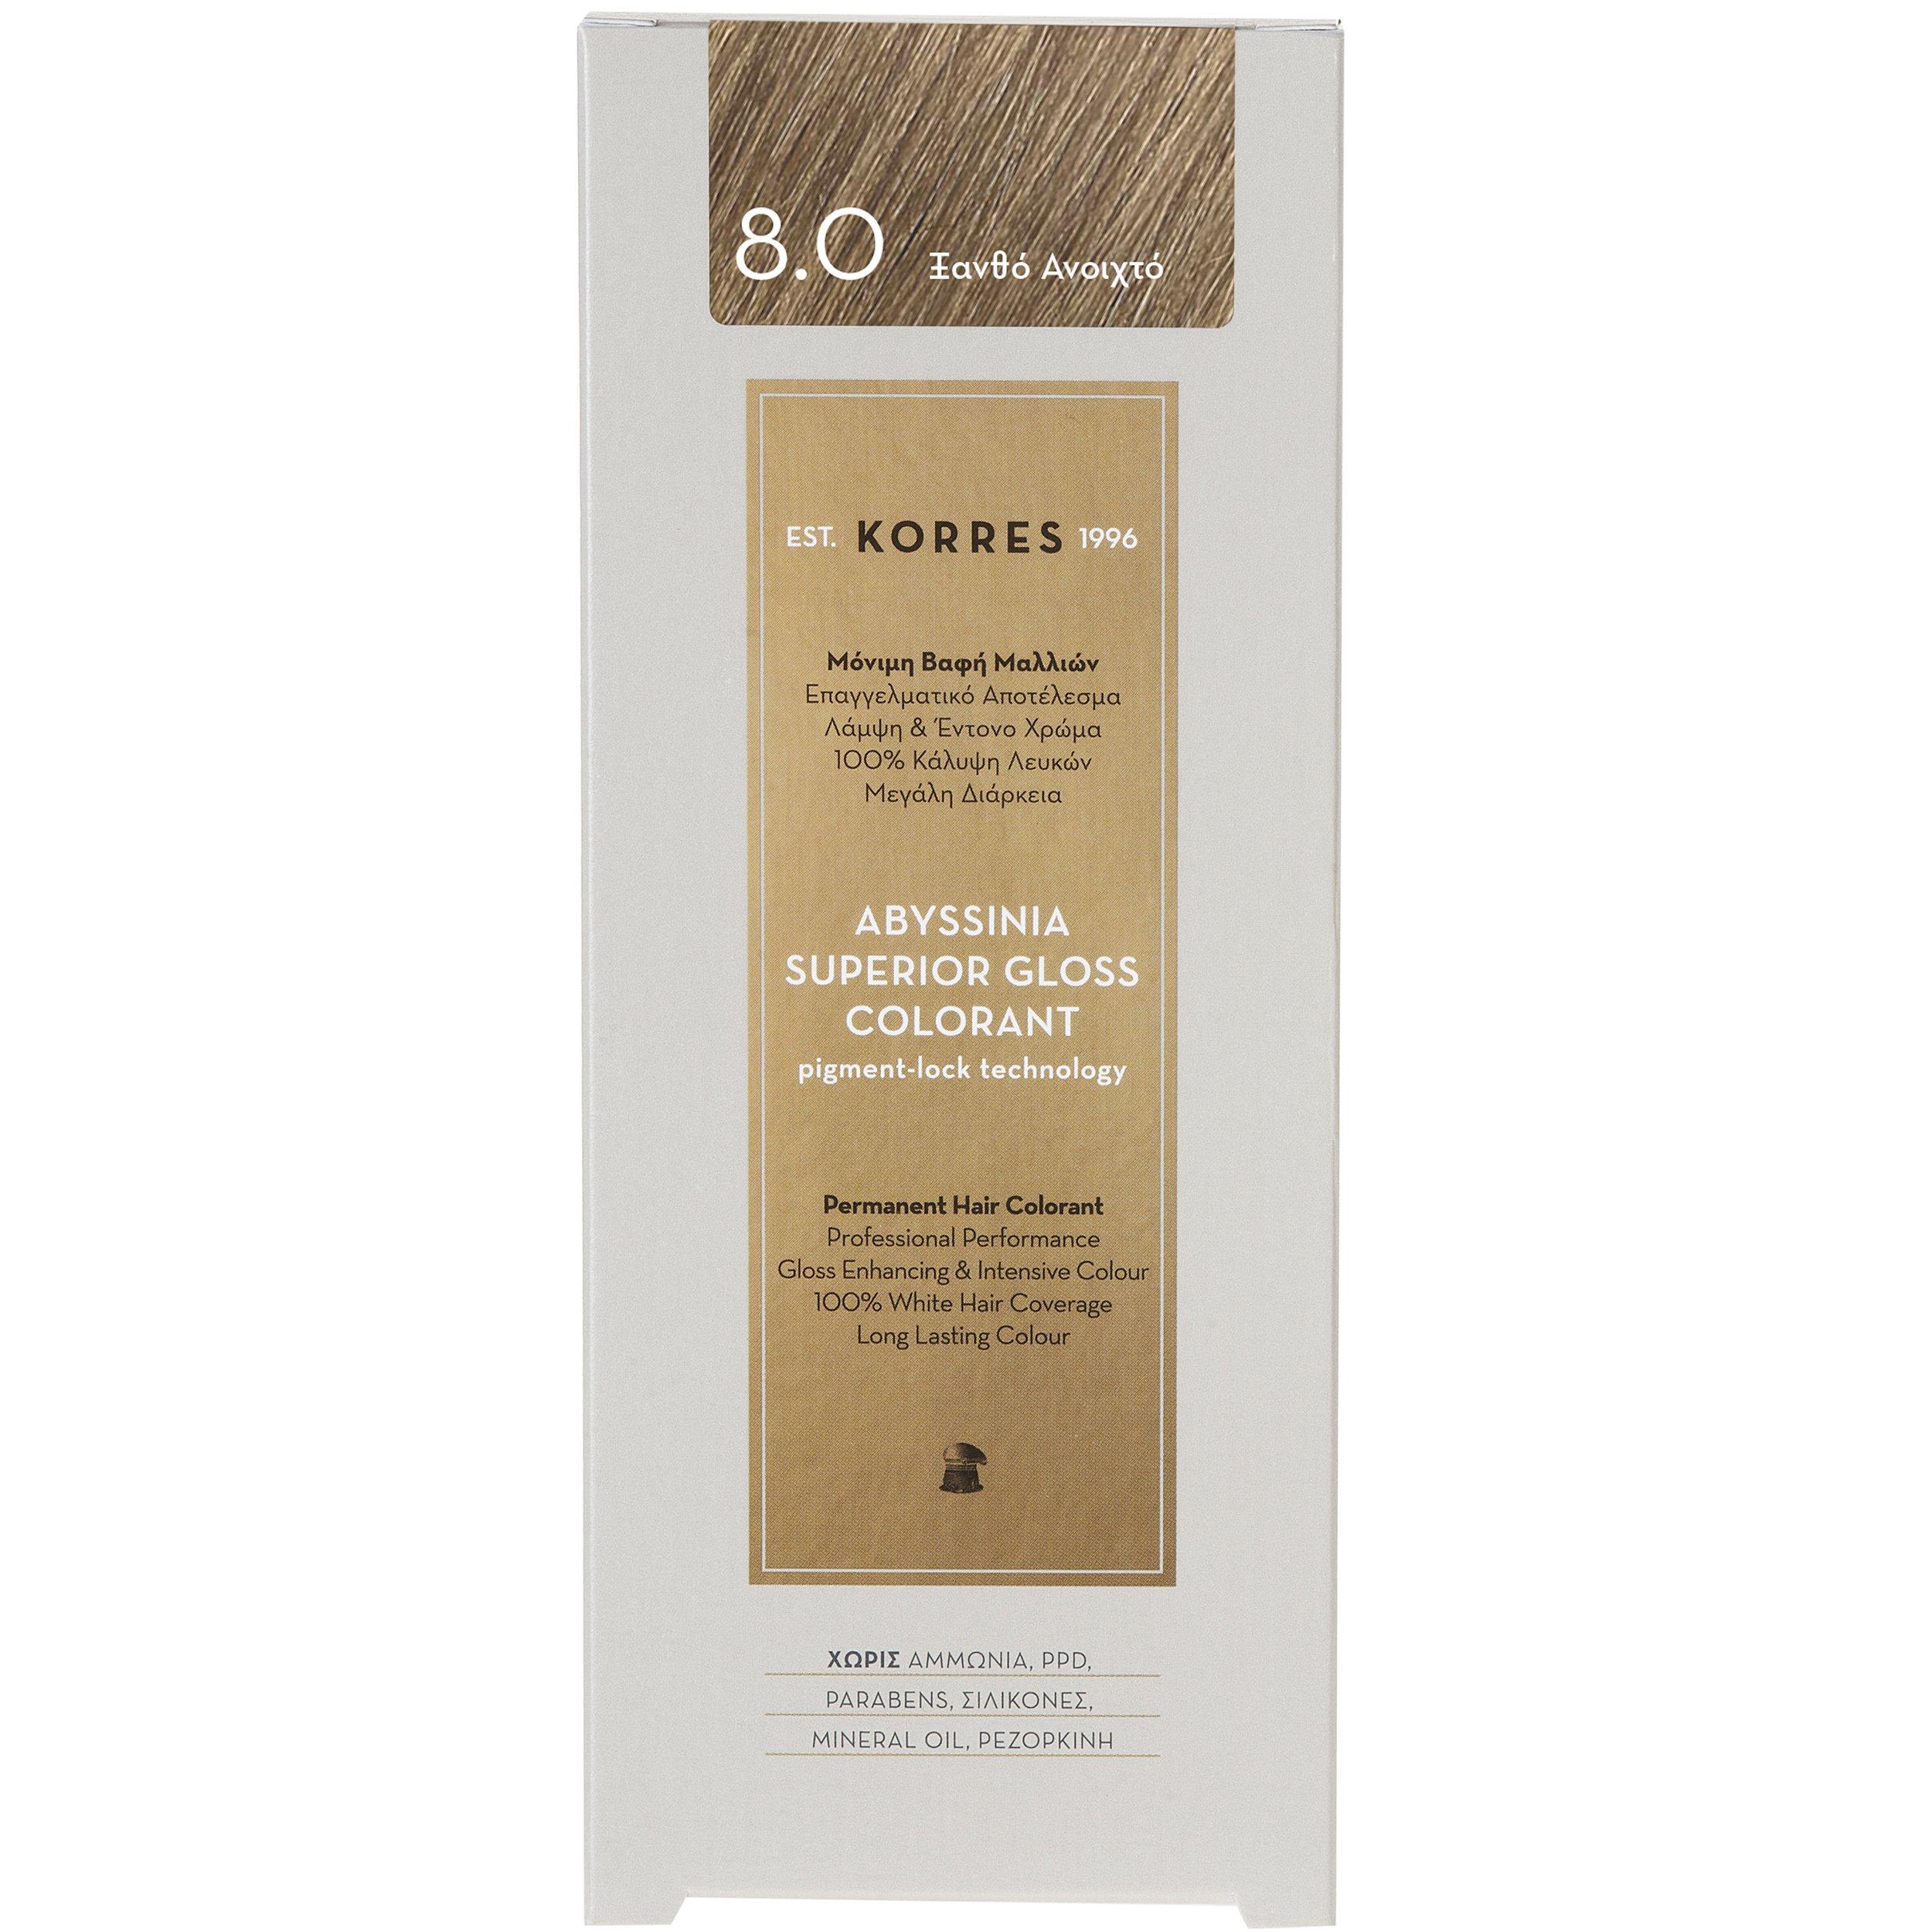 Korres Abyssinia Superior Gloss Colorant Επαγγελματικό Αποτέλεσμα Λάμψη & Έντονο Χρώμα – 8.0 ΞΑΝΘΟ ΑΝΟΙΚΤΟ